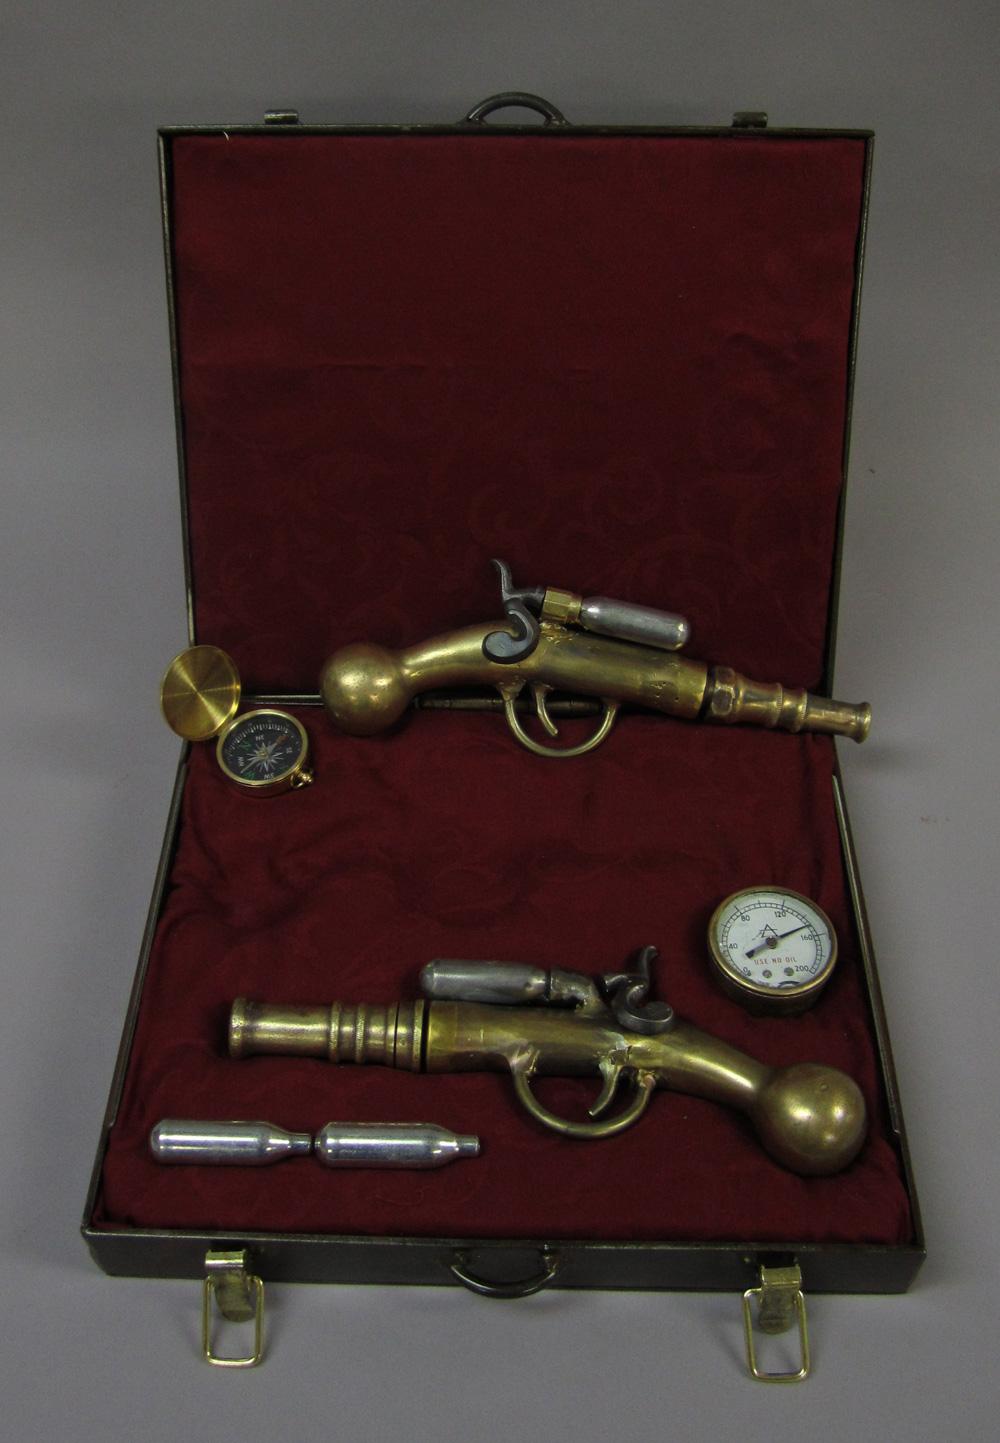 Steampunk pistols